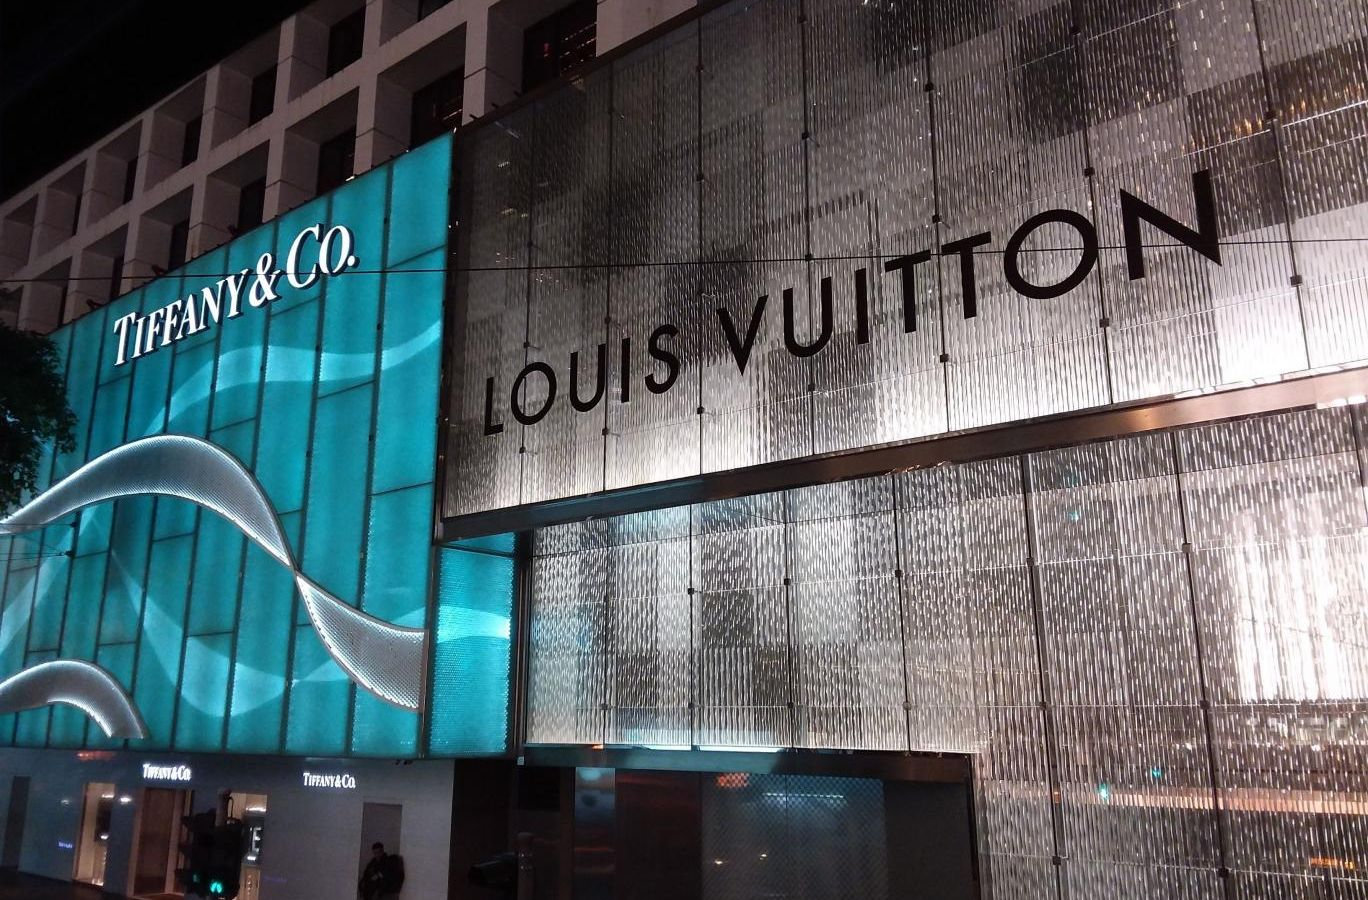 Tiffany Louis Vuitton: Μια συμφωνία 16 δισ. δολαρίων που δεν έγινε ποτέ